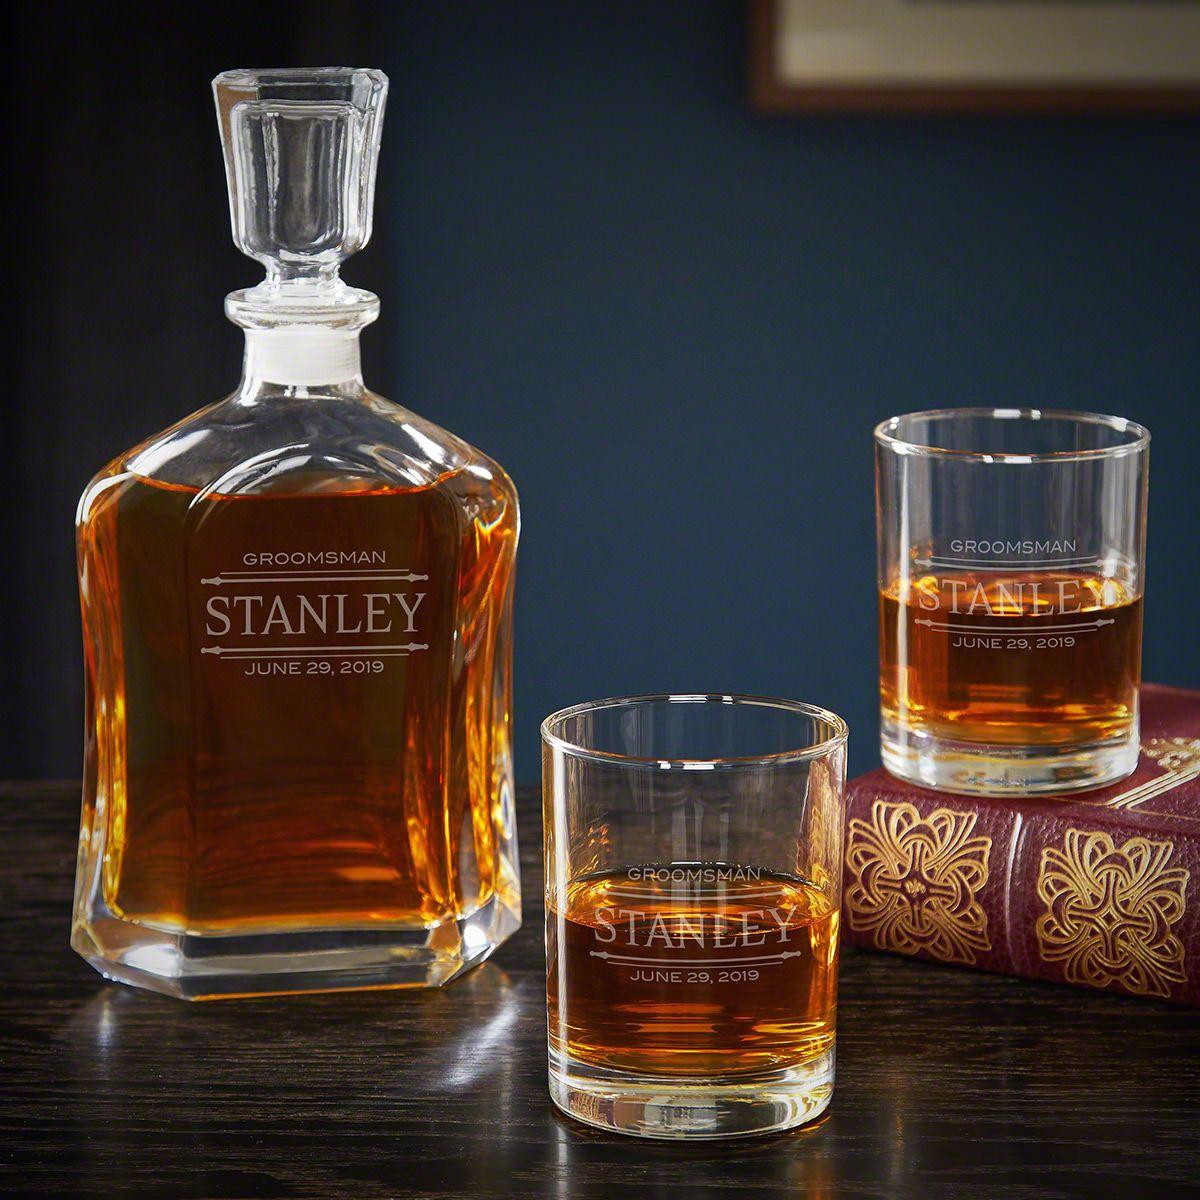 Stanley Personalized Groomsmen Decanter Gift Set